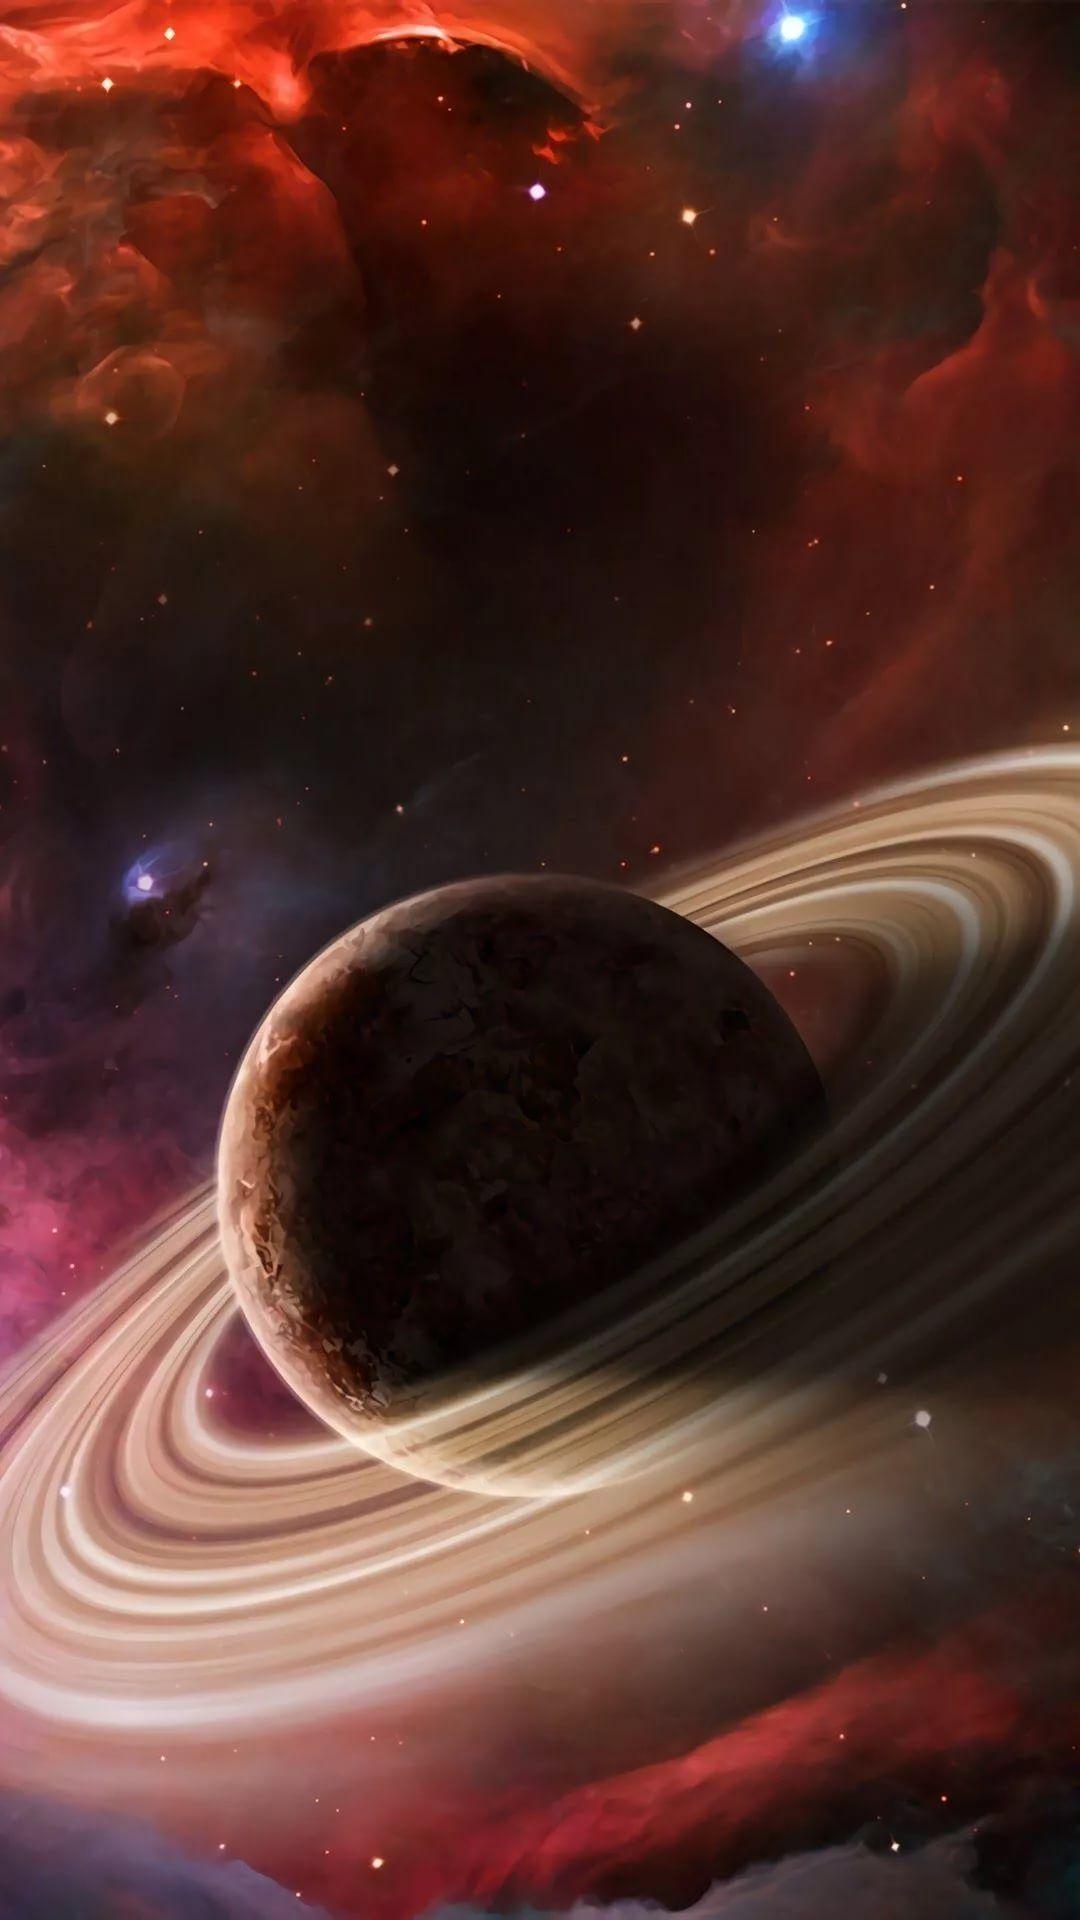 Saturn iPhone hd wallpaper